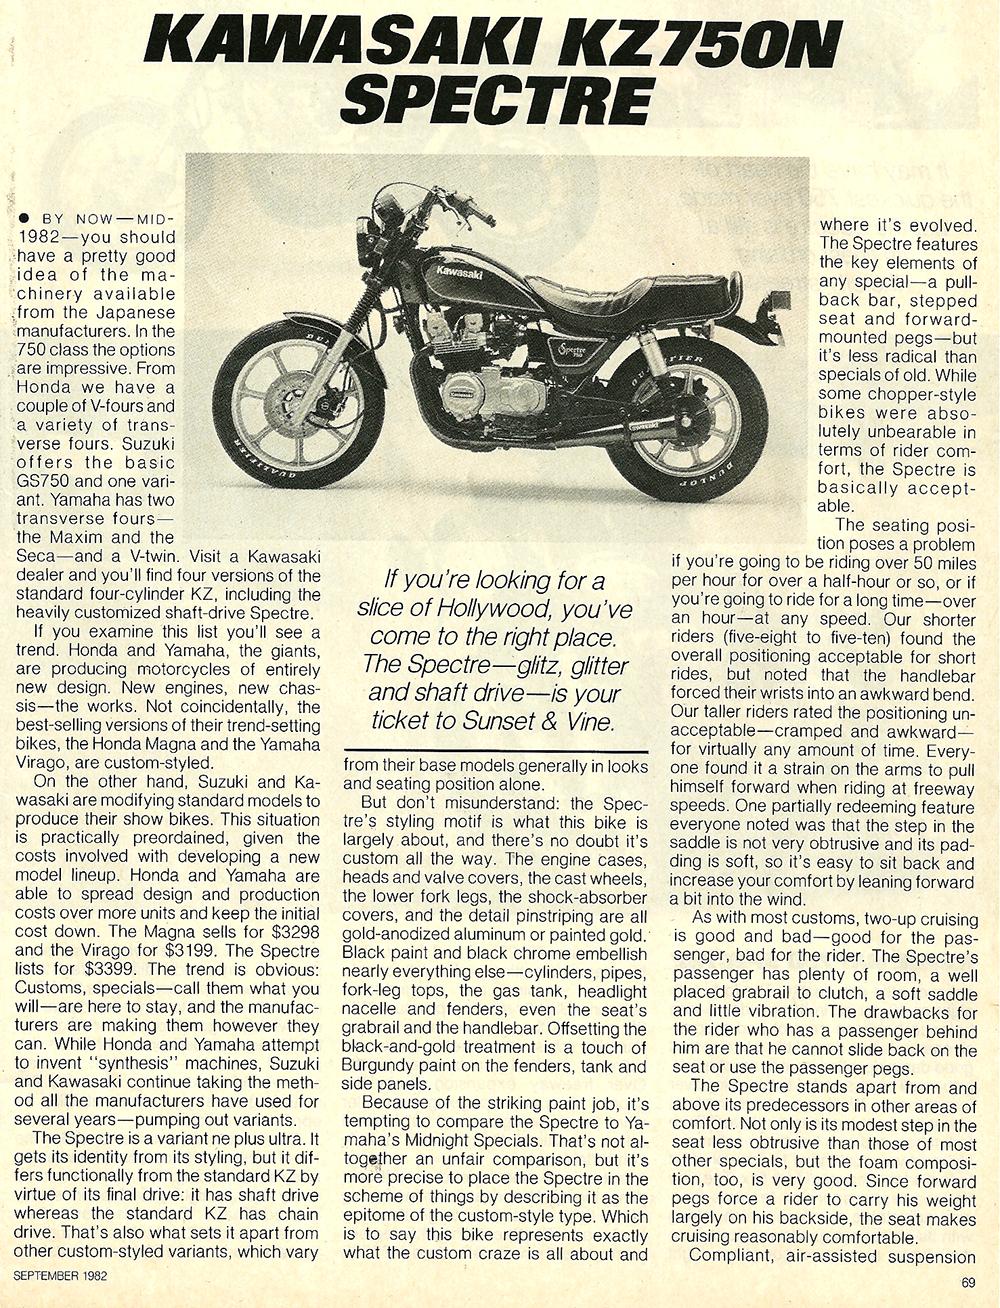 1982 Kawasaki KZ750N Spectre road test 2.jpg